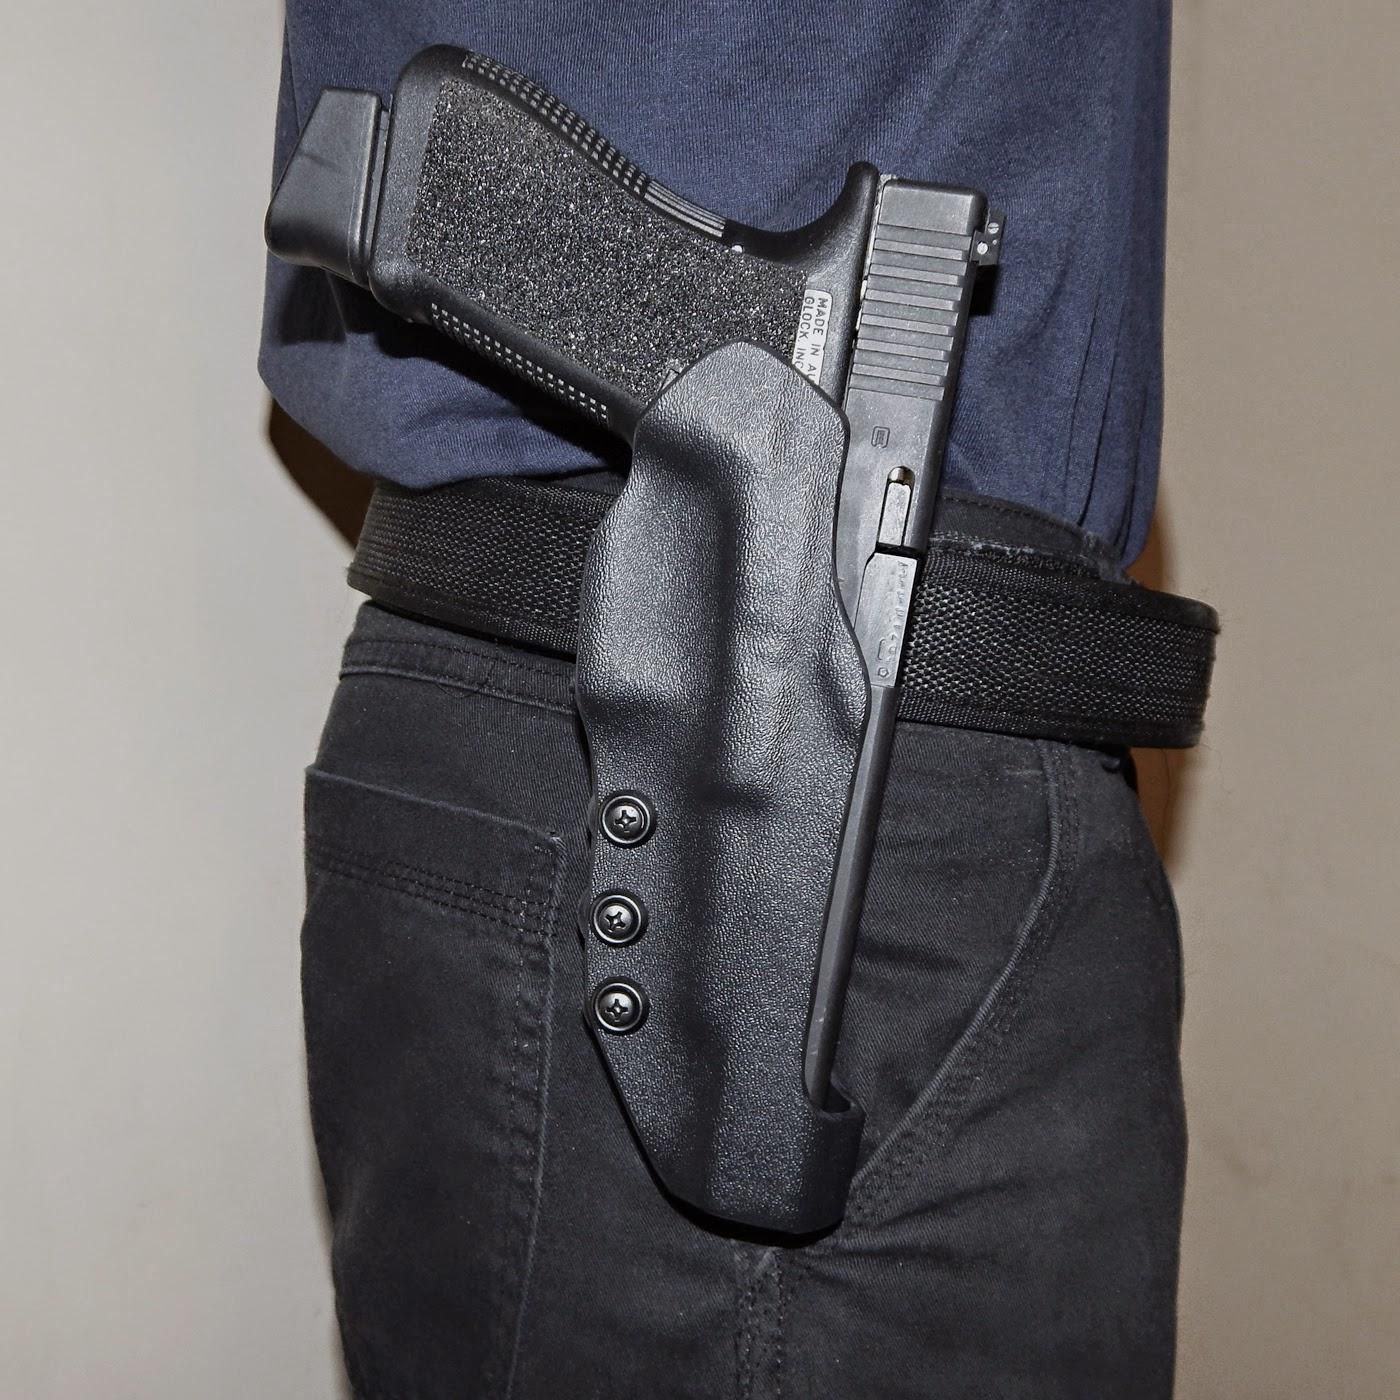 Custom glock 24